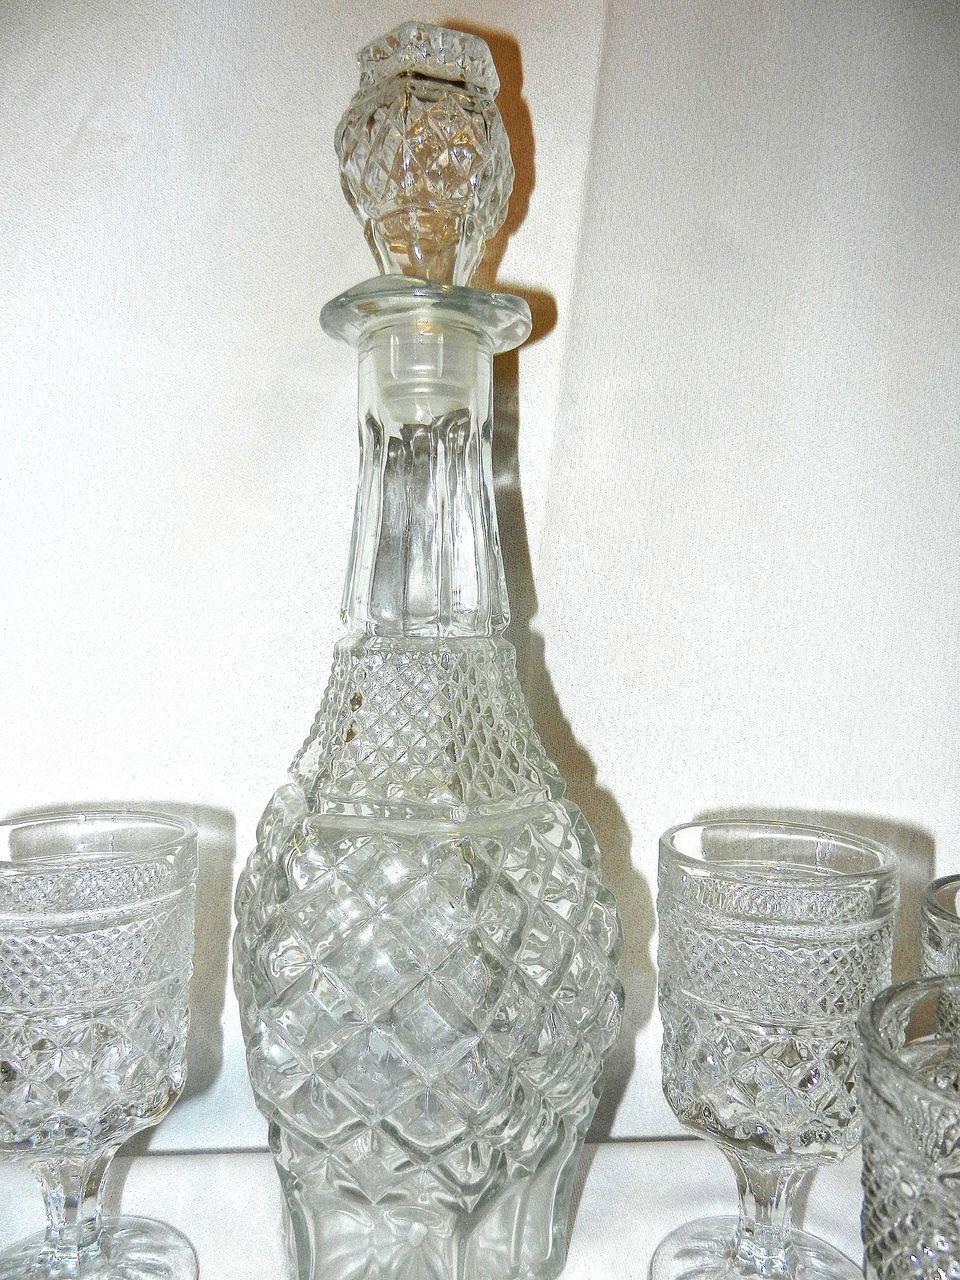 Vintage Anchor Hocking Wexford Wine Decanter Glass Set Glass Decanter Set Glass Vintage Glassware